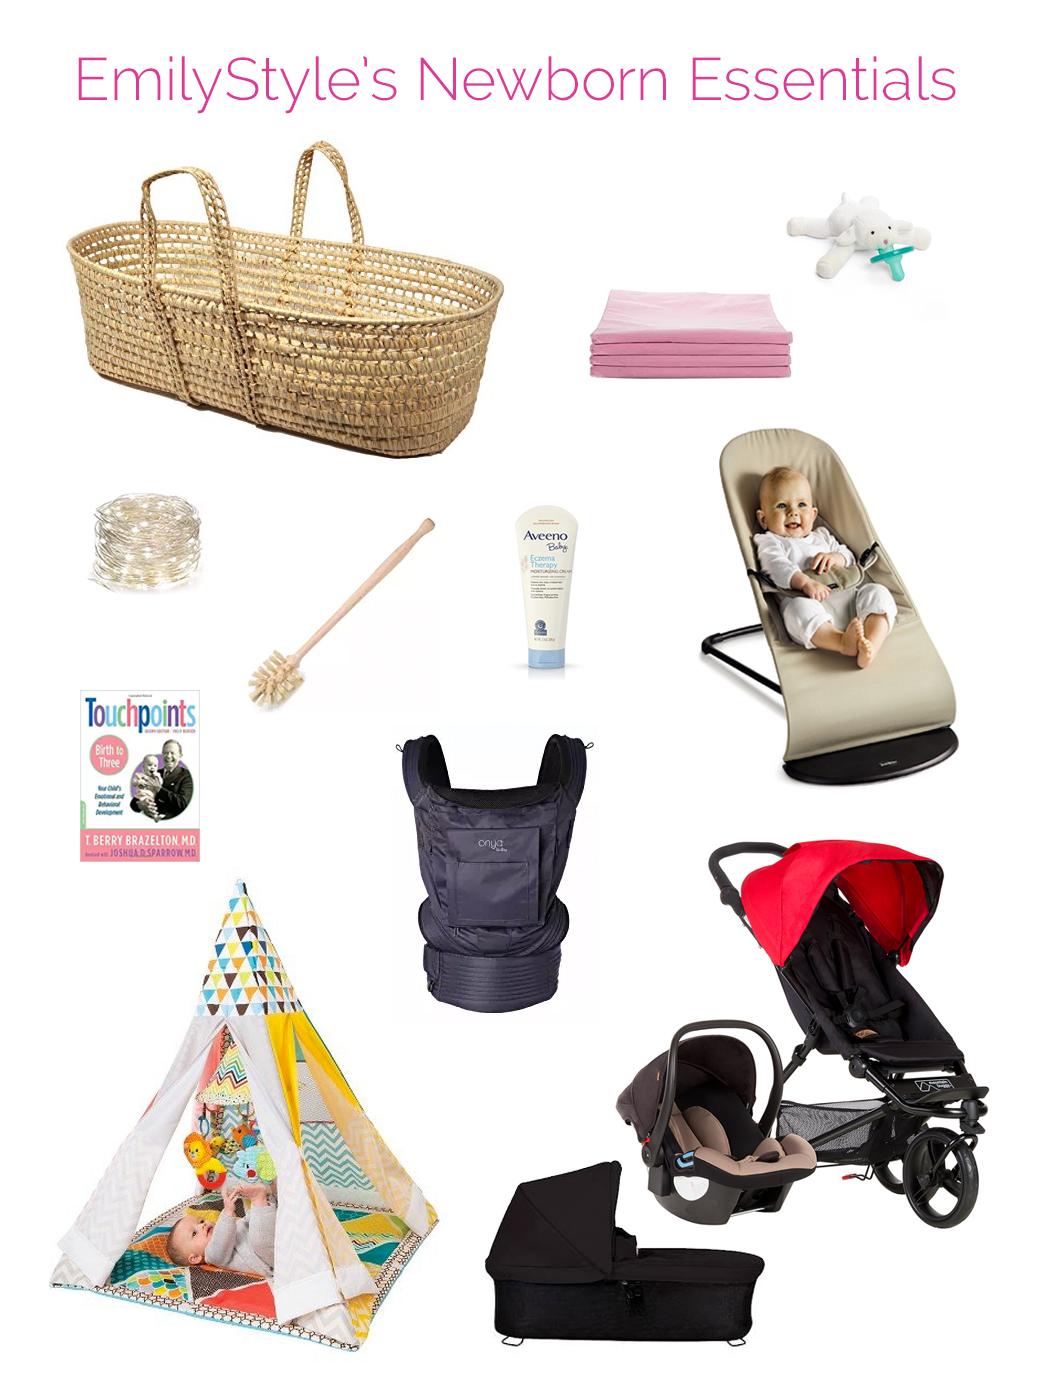 A pragmatic, tested set of newborn essentials